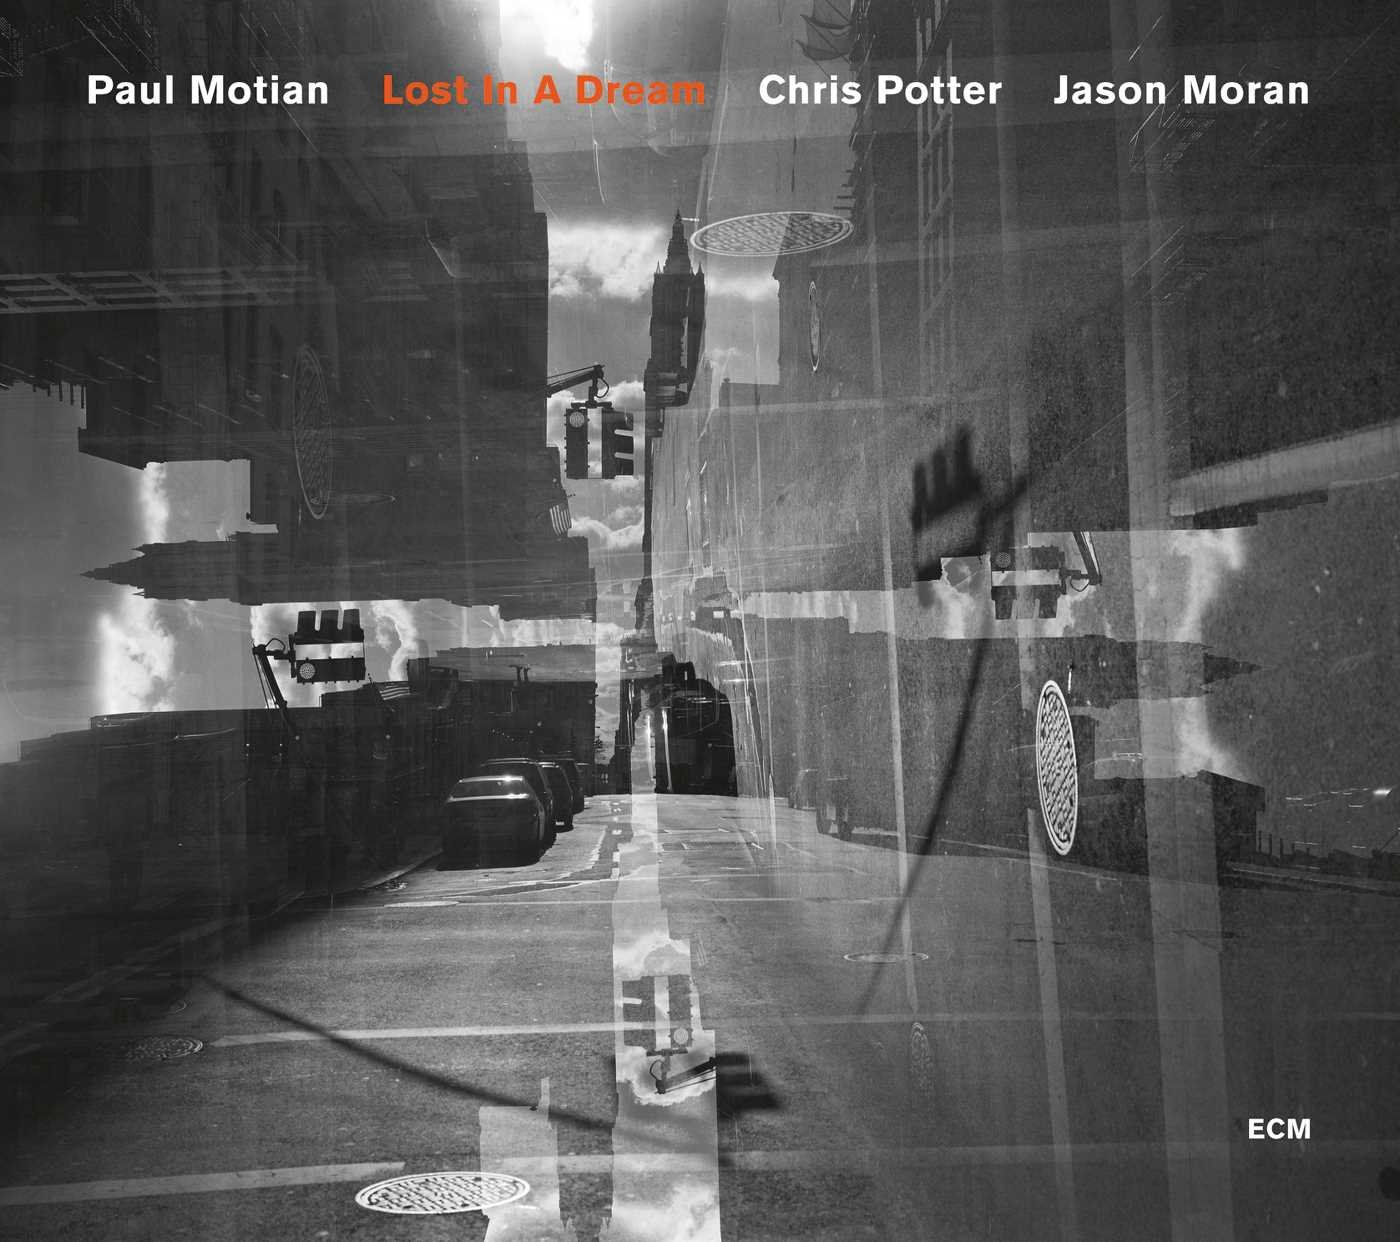 Paul Motian, Chris Potter, Jason Moran - Lost in a Dream - Amazon ...